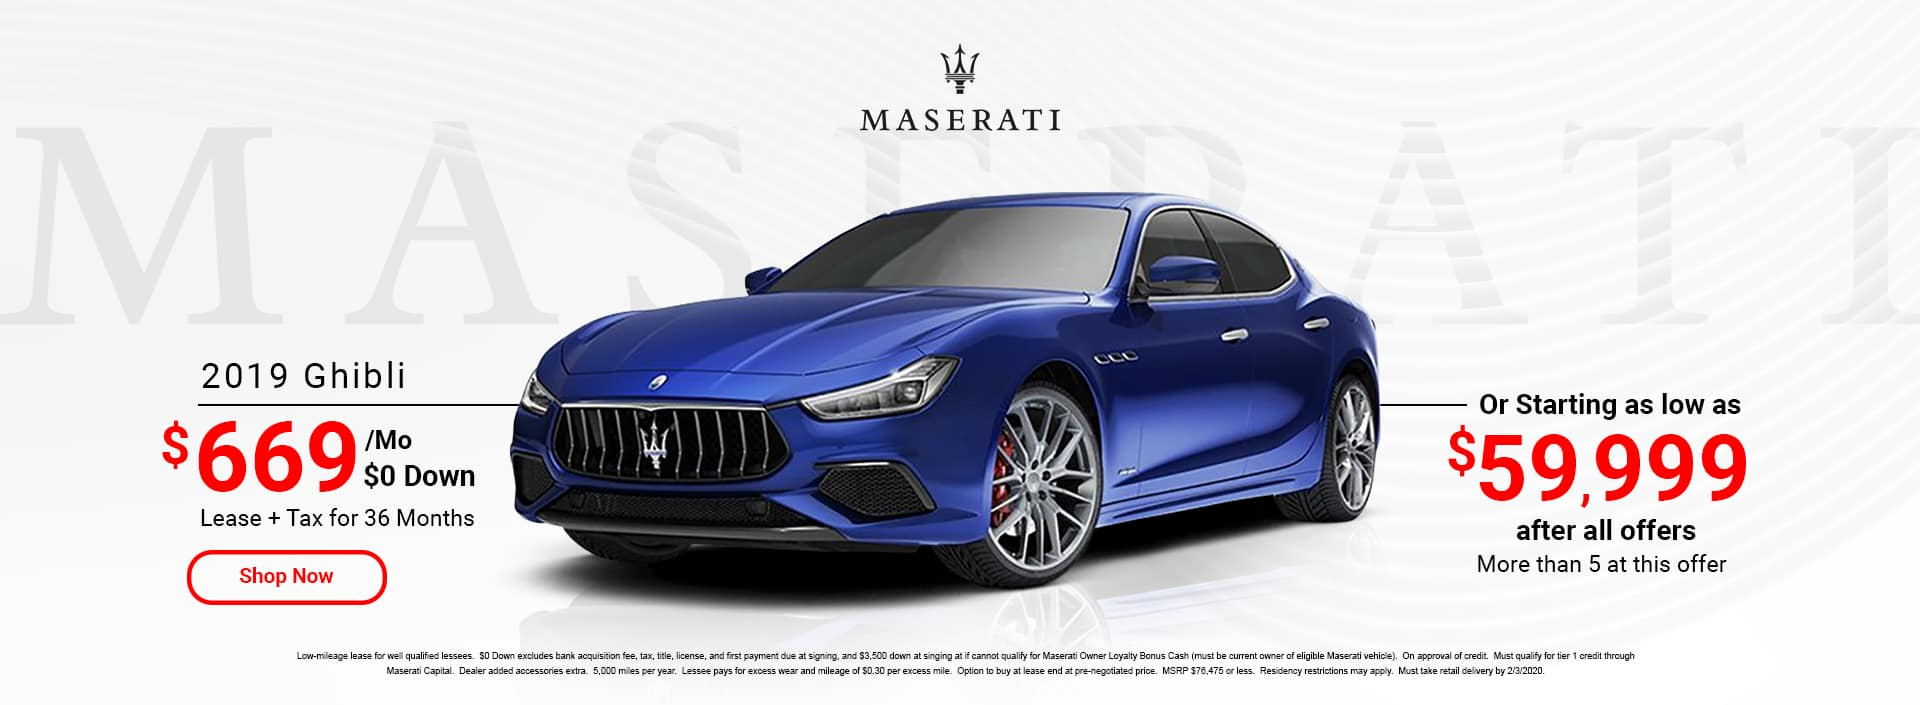 Who Owns Maserati >> Maserati Near Los Angeles Ca Russell Westbrook Maserati